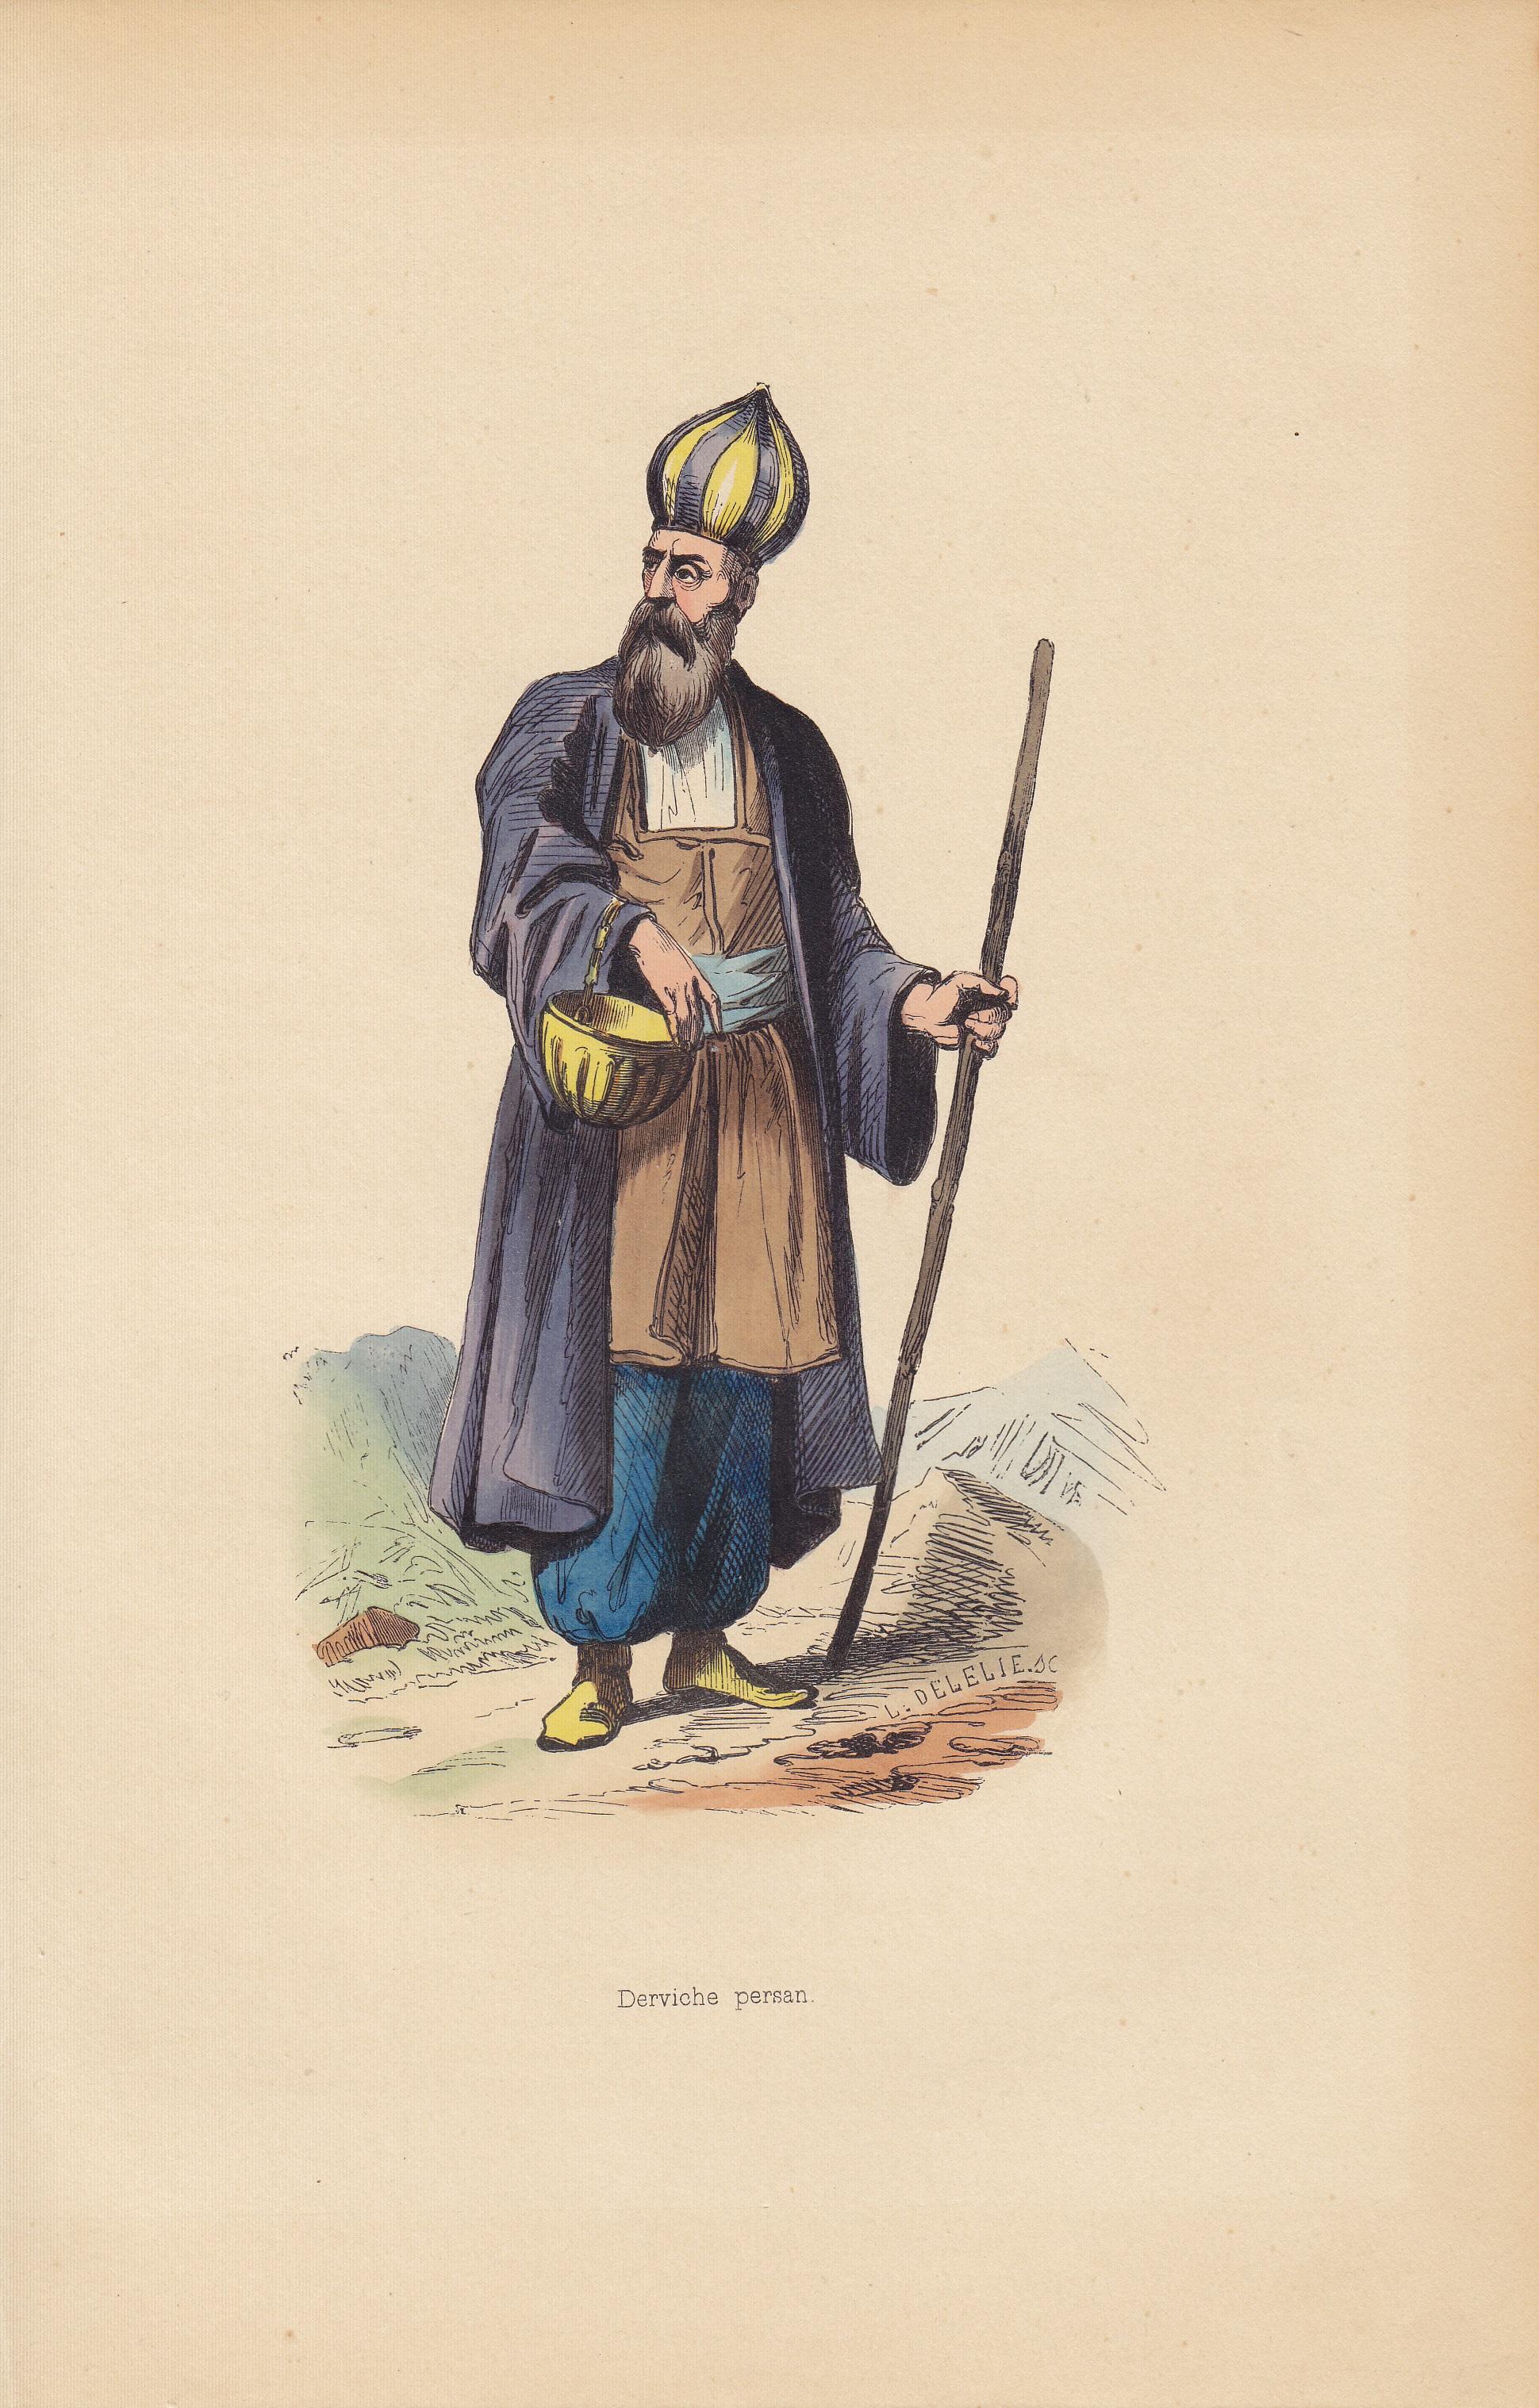 Derviche Persan